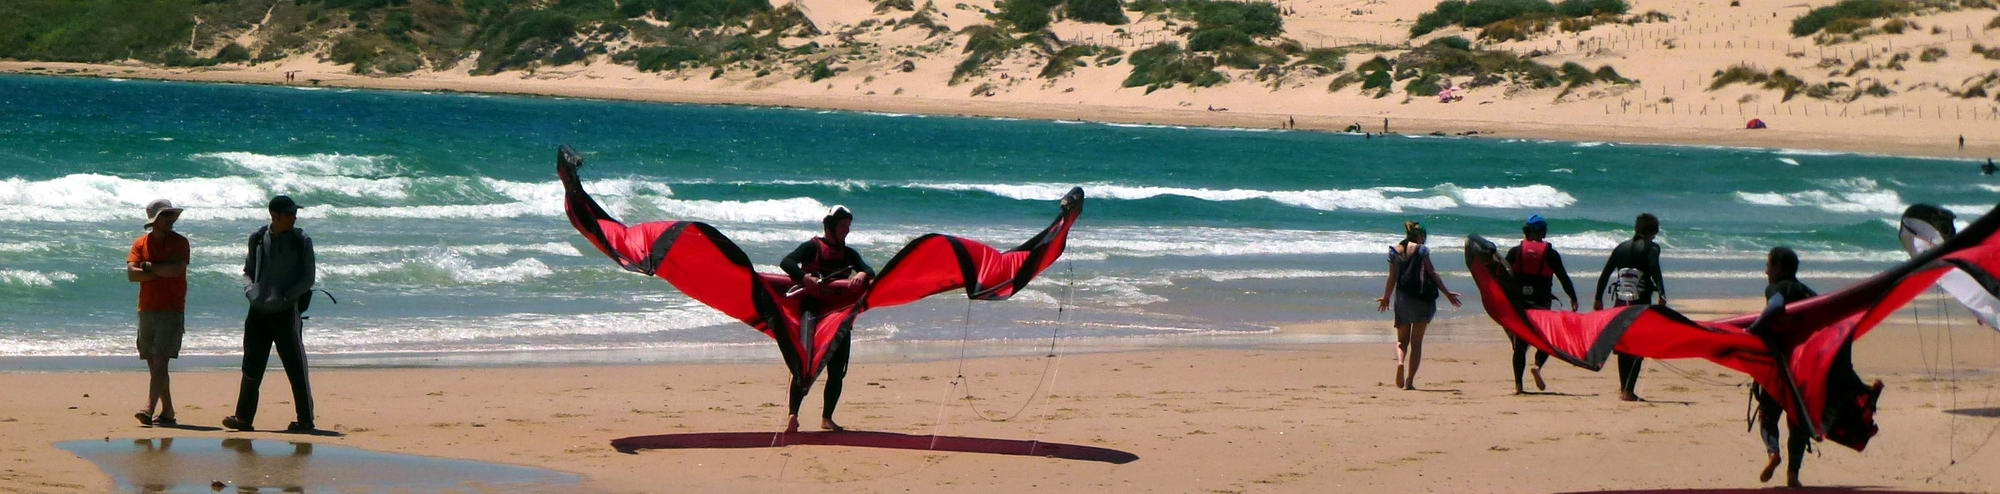 Cursos Total Kitesurf - Conil - Cádiz - Tarifa